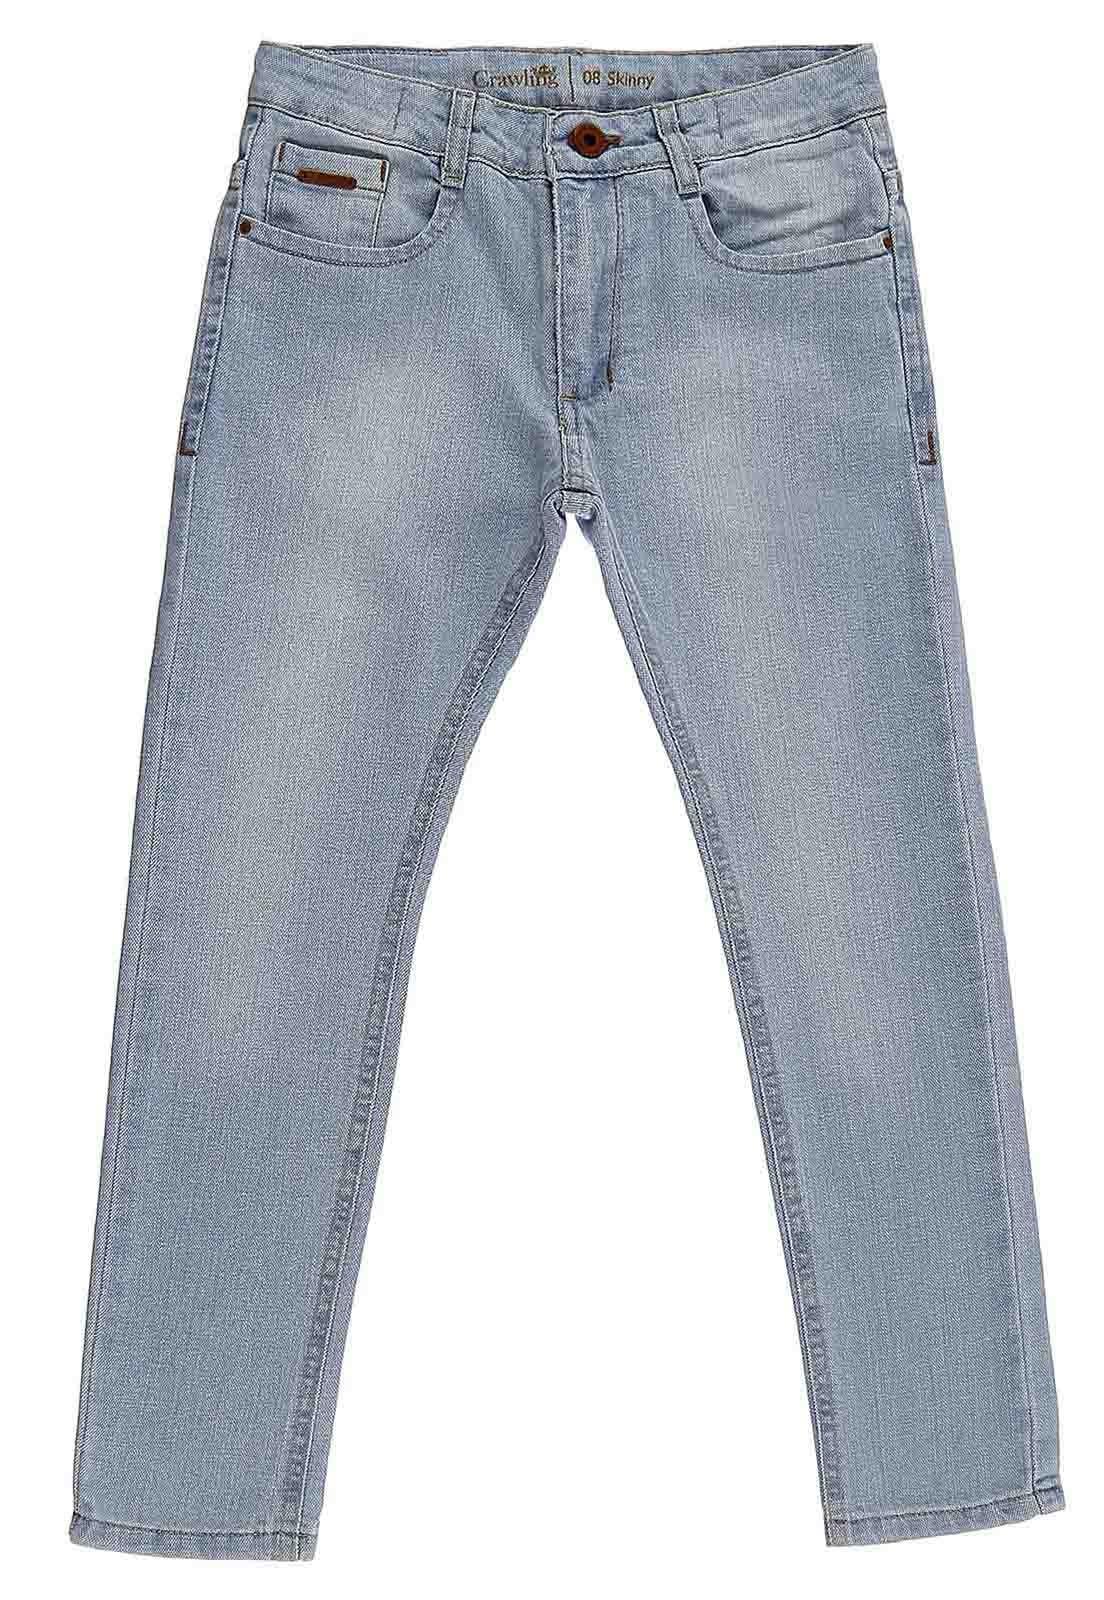 Calça Crawling Jeans Skinny Masculina Comfty